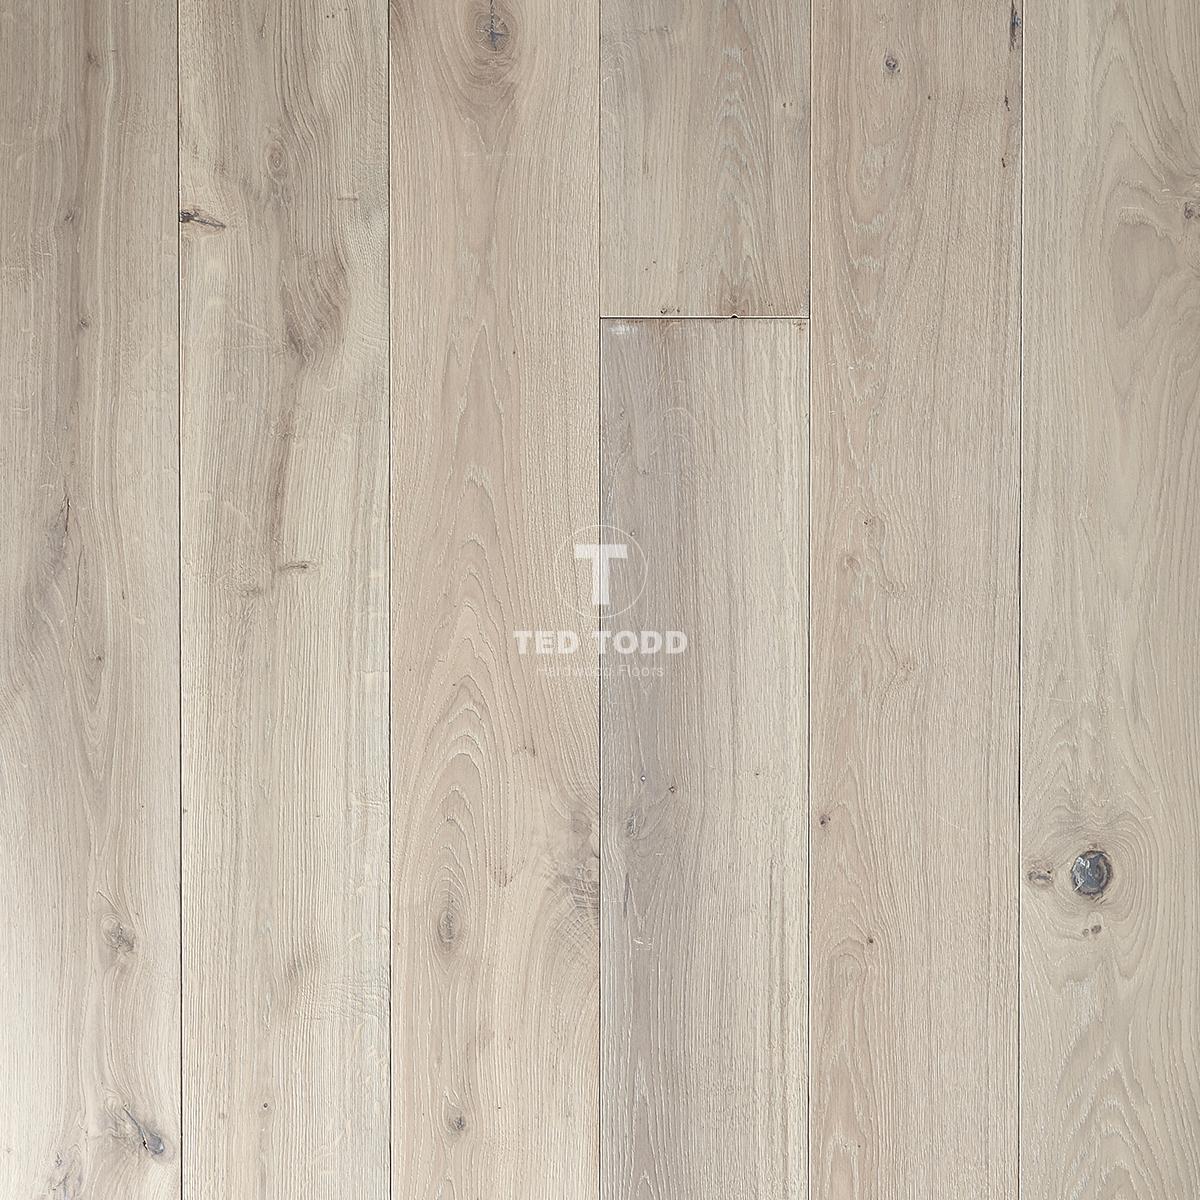 Ted todd dalby engineered wood bestatflooring for Wood flooring supplies